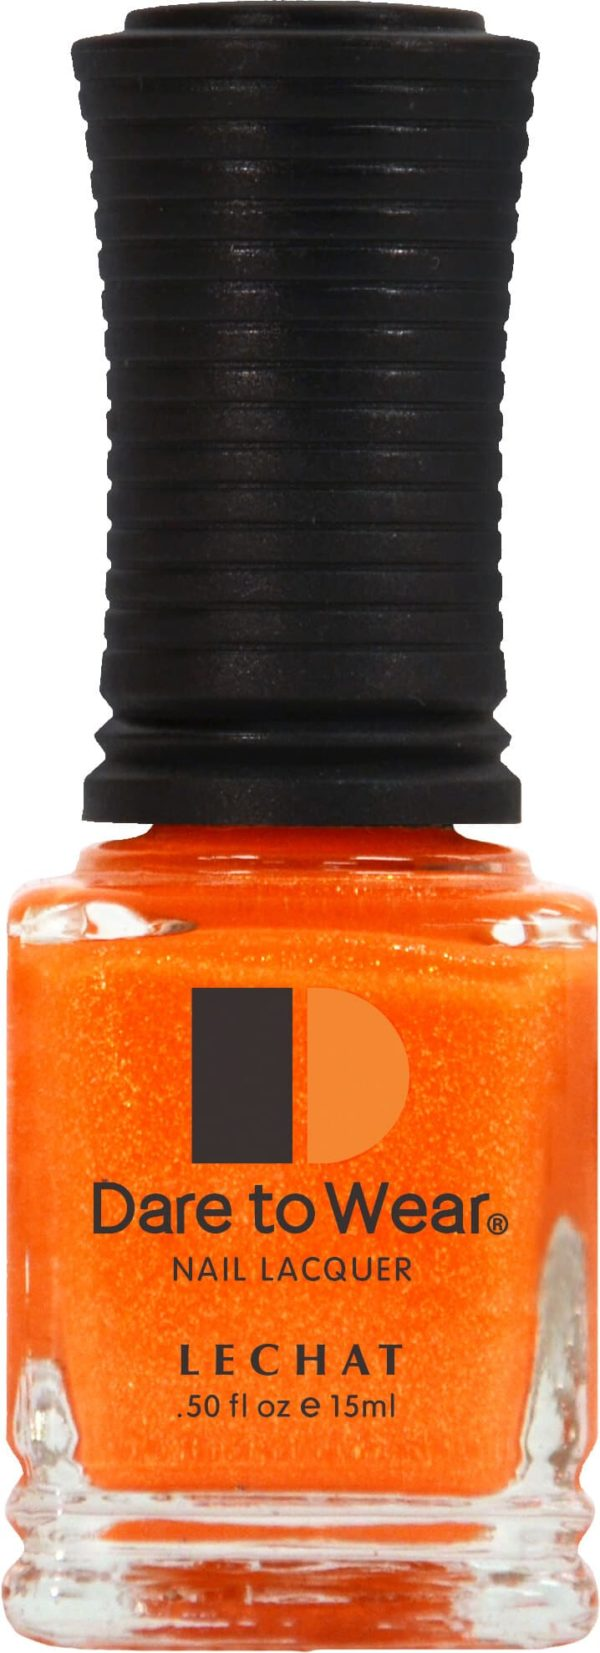 half fluid ounce bottle of orange Dare to Wear lacquer.